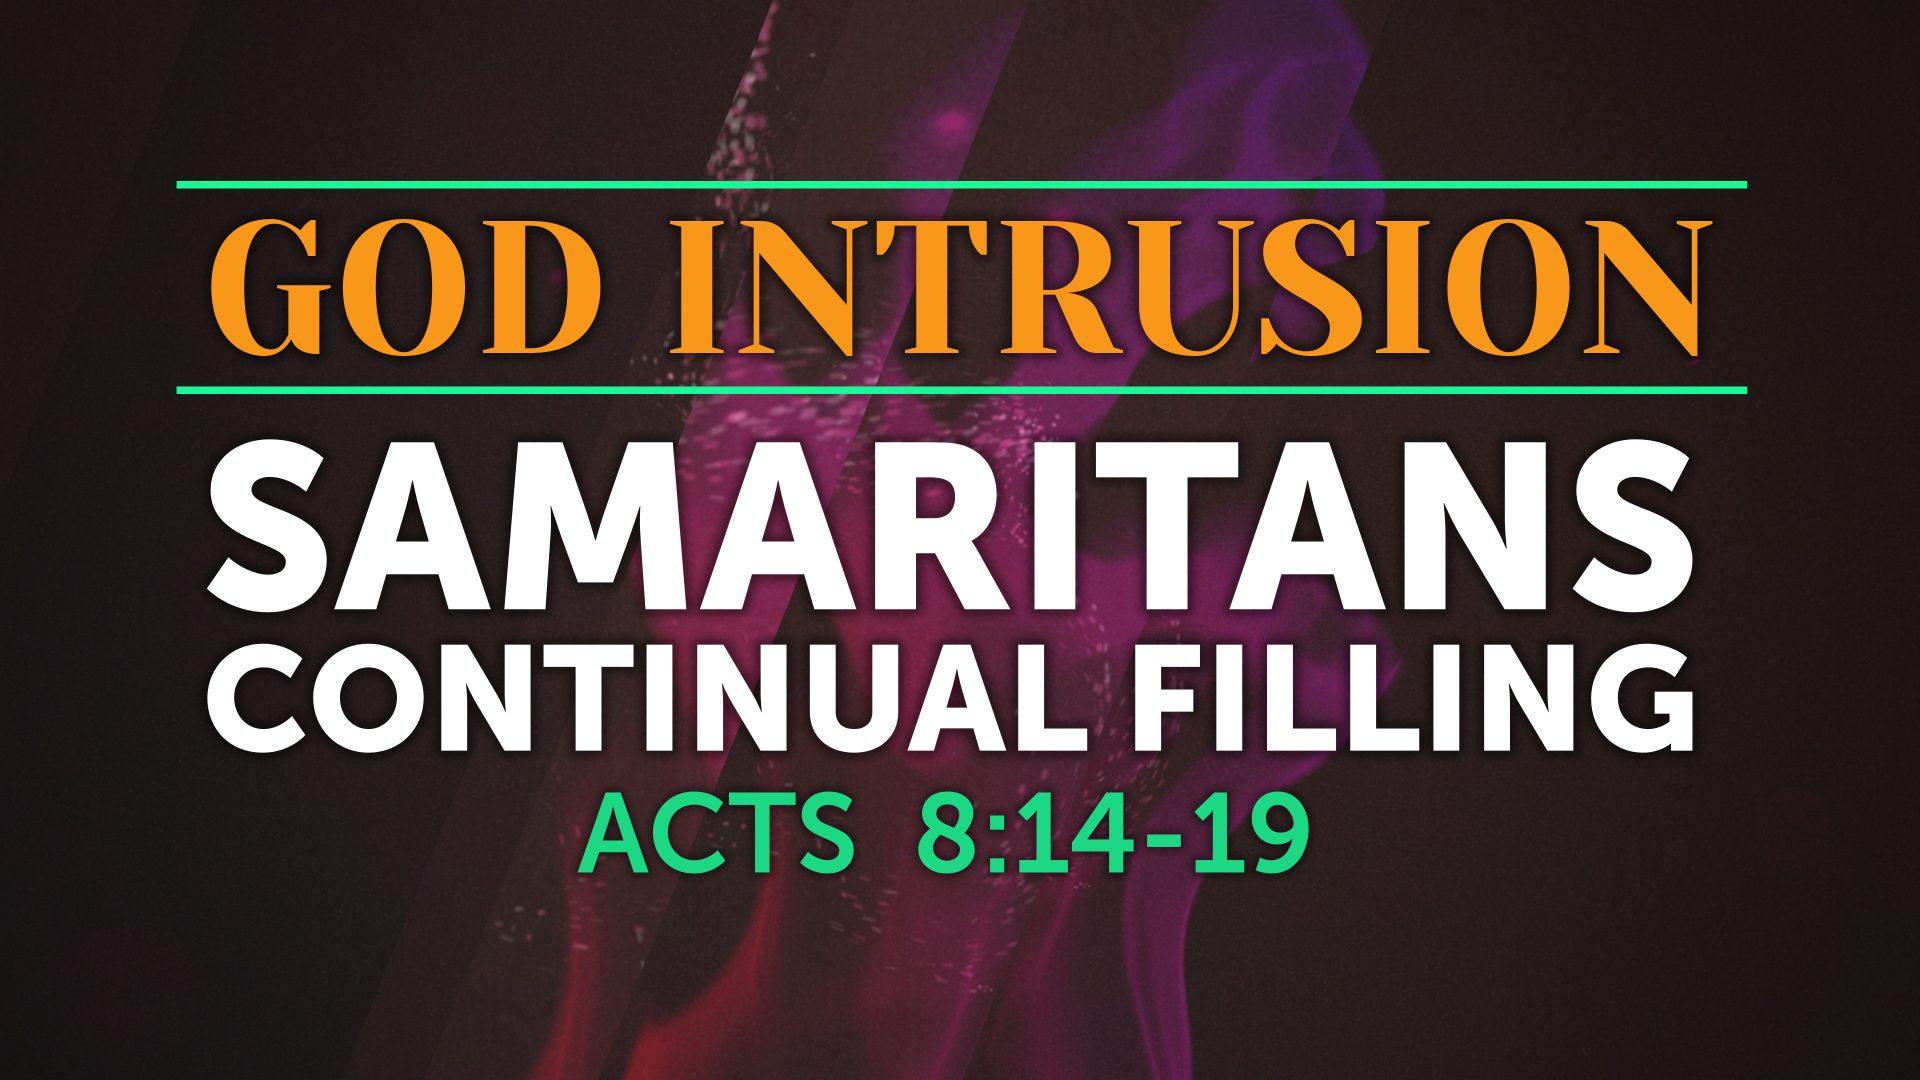 God Intrusion - Continual Filling